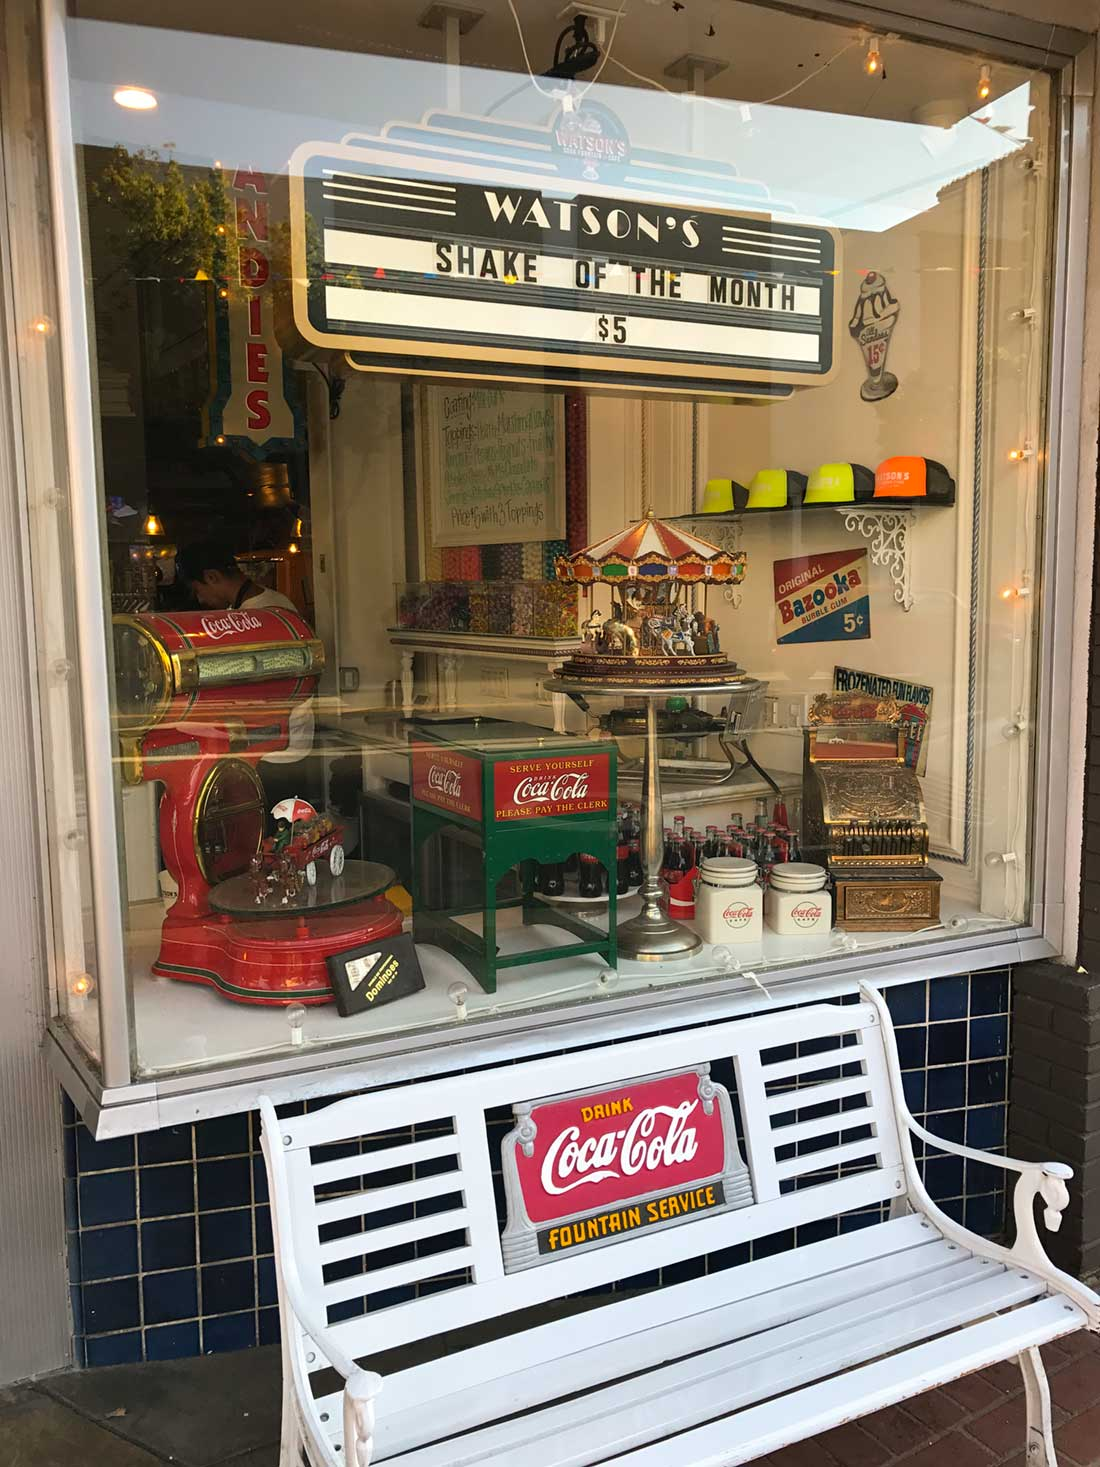 Watson's Soda Fountain and Cafe window